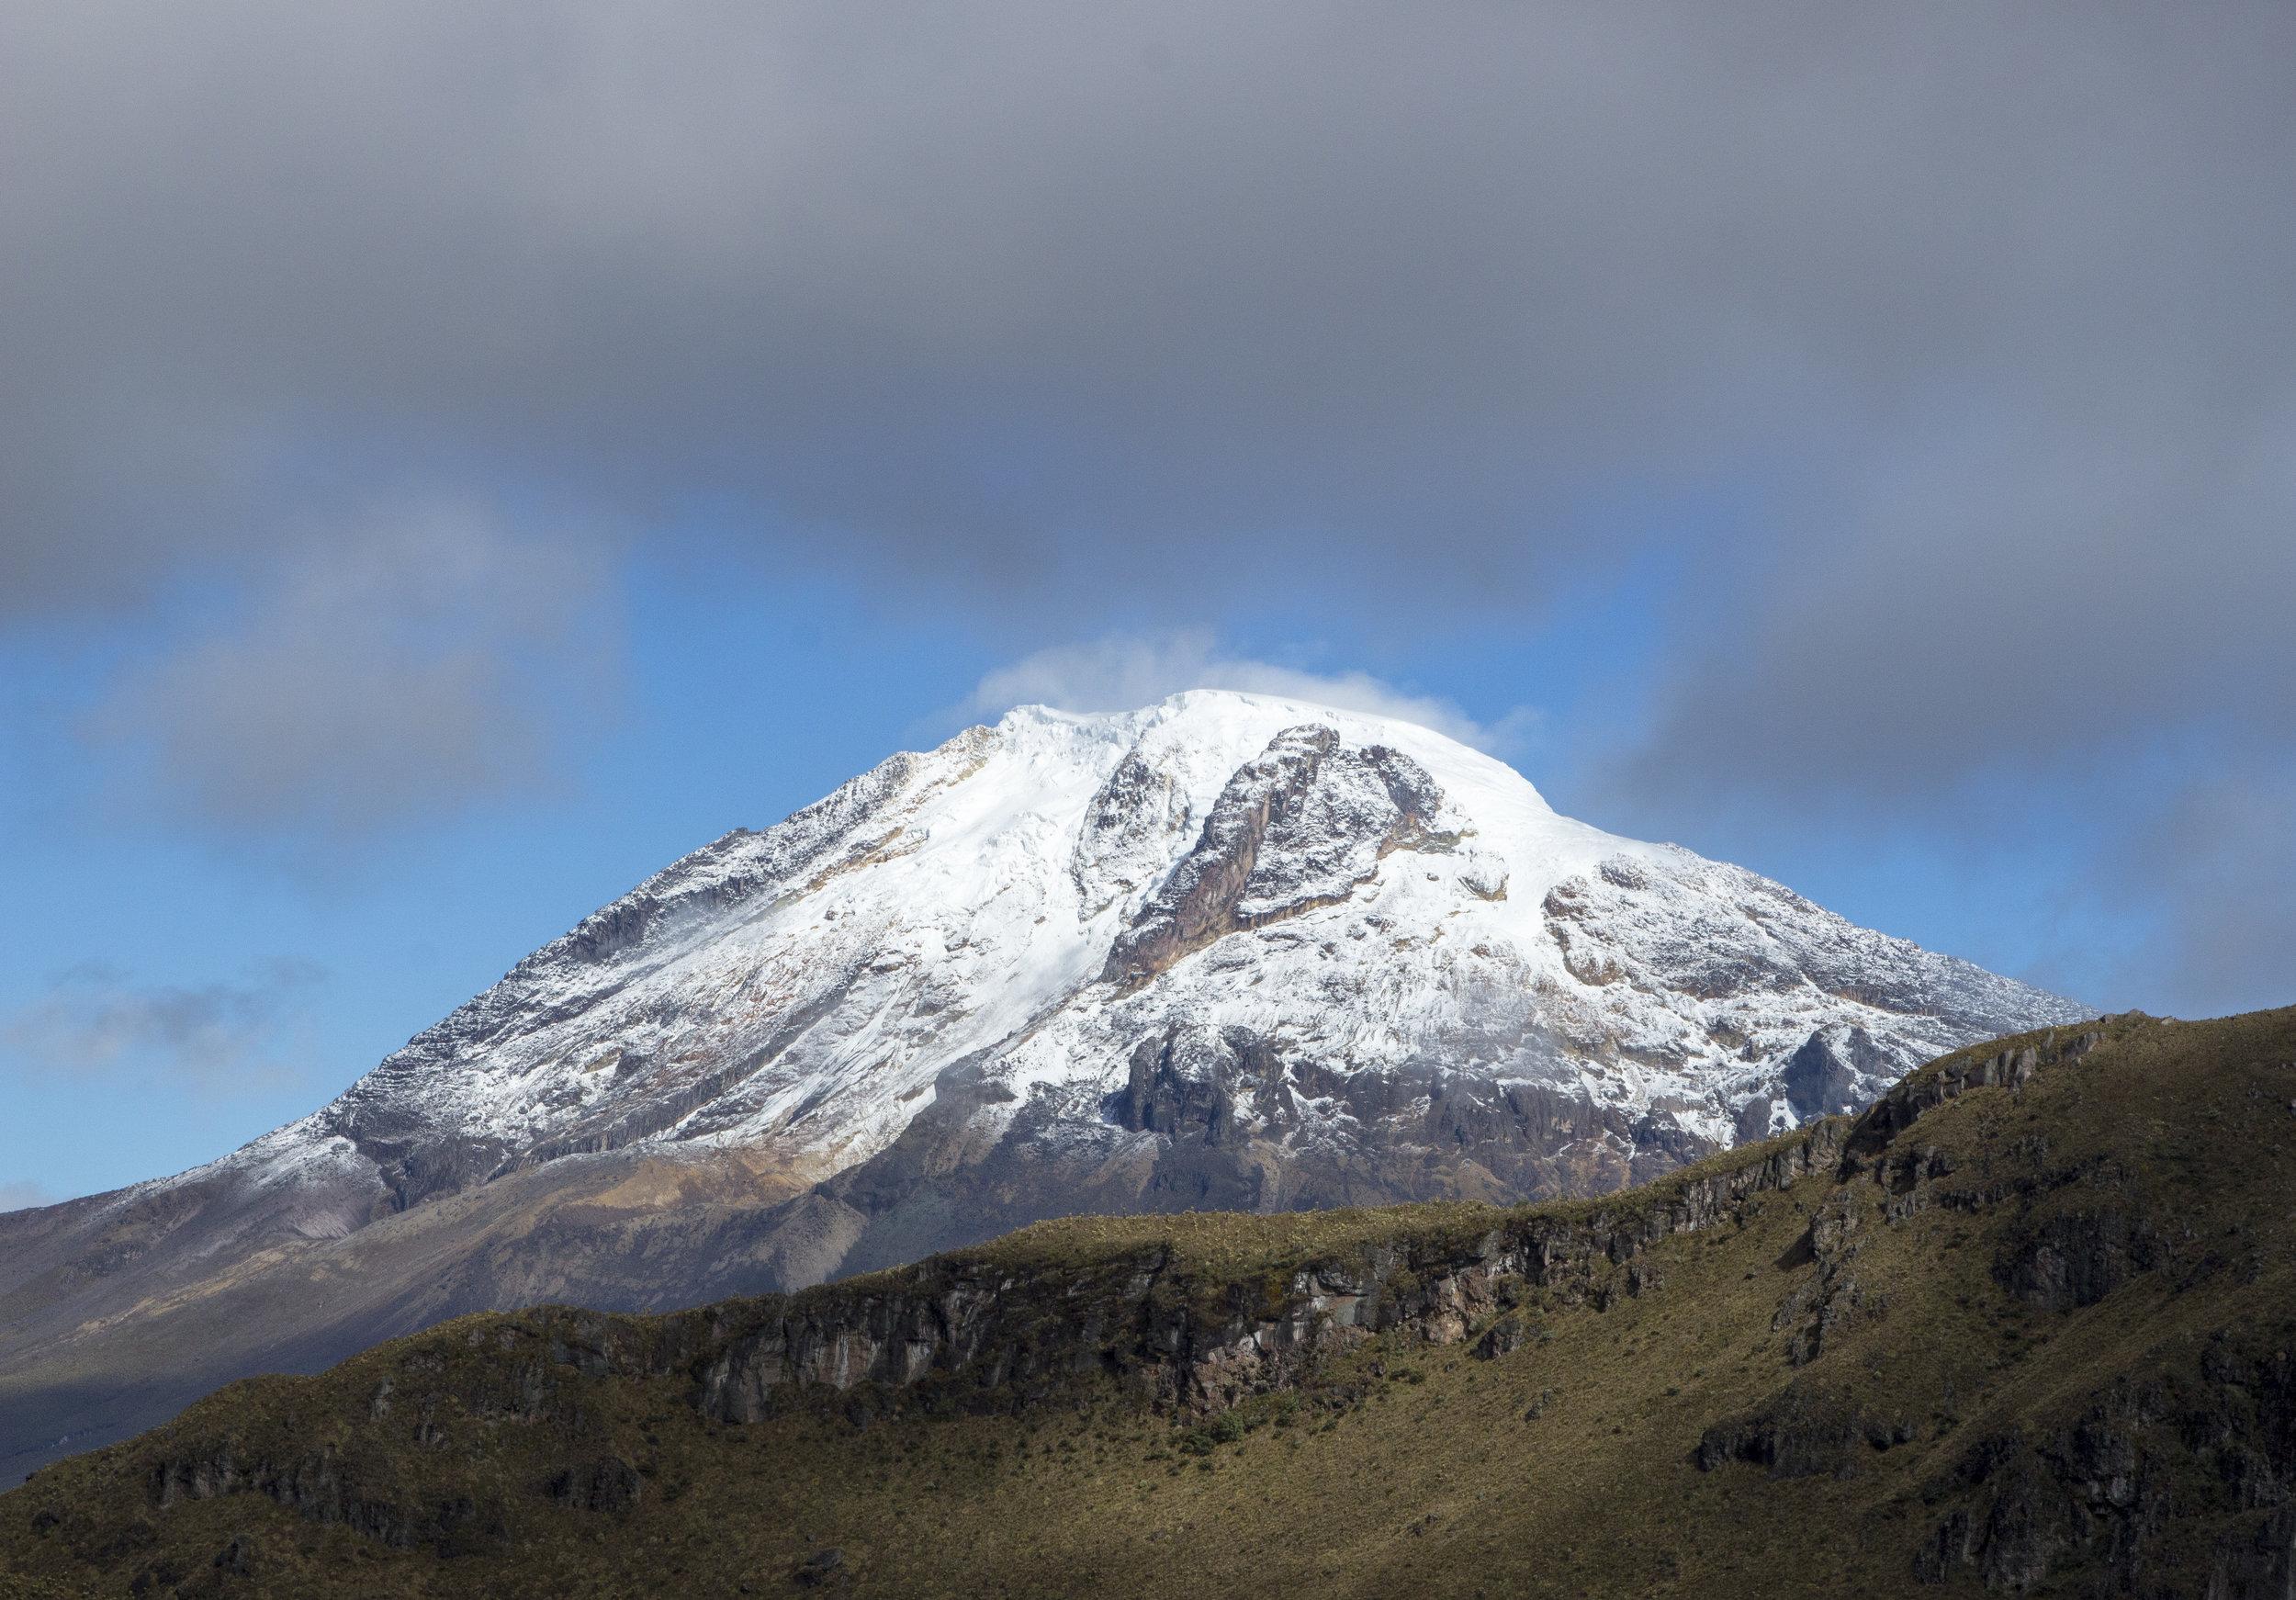 Nevado-del-Tolima-PNN-Los-Nevados-Central-Andes-Colombia-Trekking-Colombian-Project-1.jpg